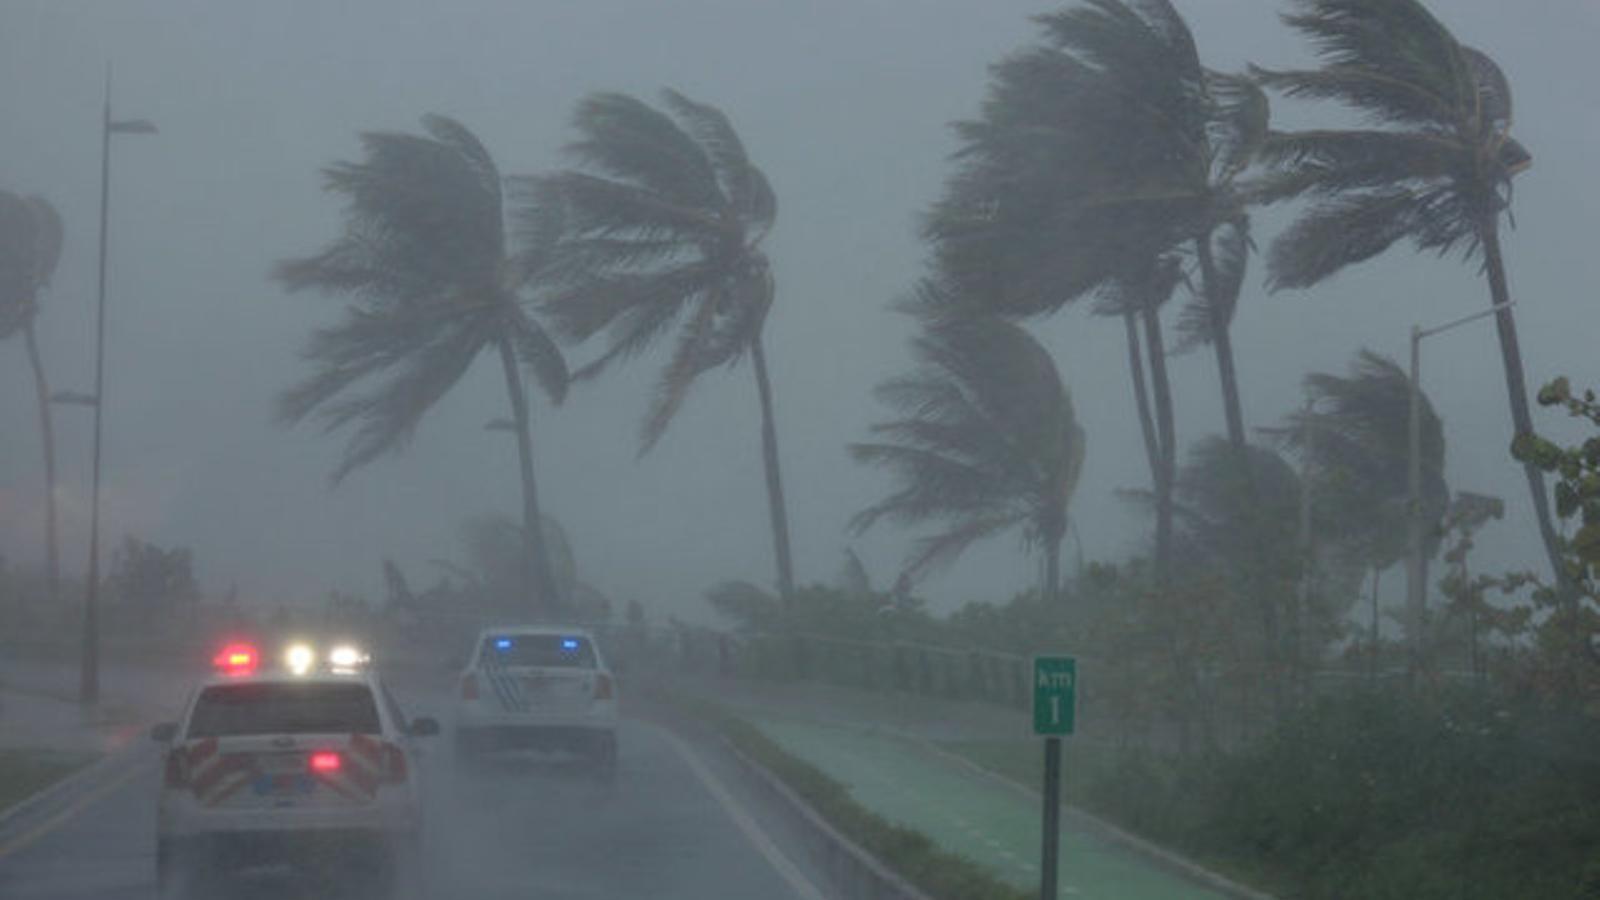 L''Irma' ja colpeja una Florida tancada a casa